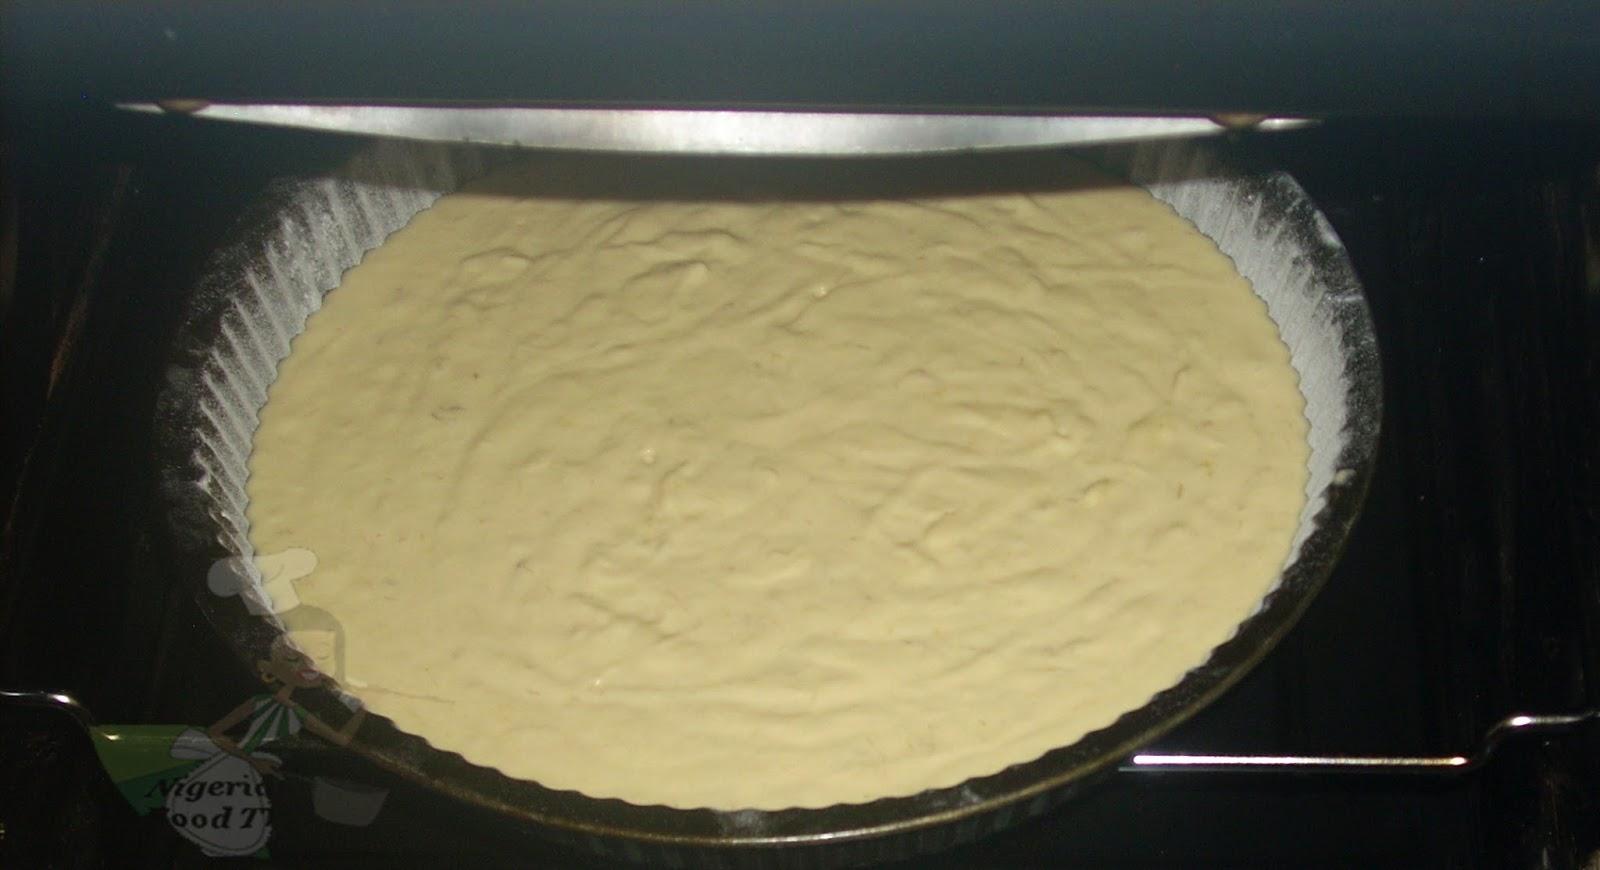 Banana Cake Recipe, Easy Banana Cake Recipe, Easy Banana Cake Recipe all purpose flour, Easy Banana Cake Recipe with plain flour